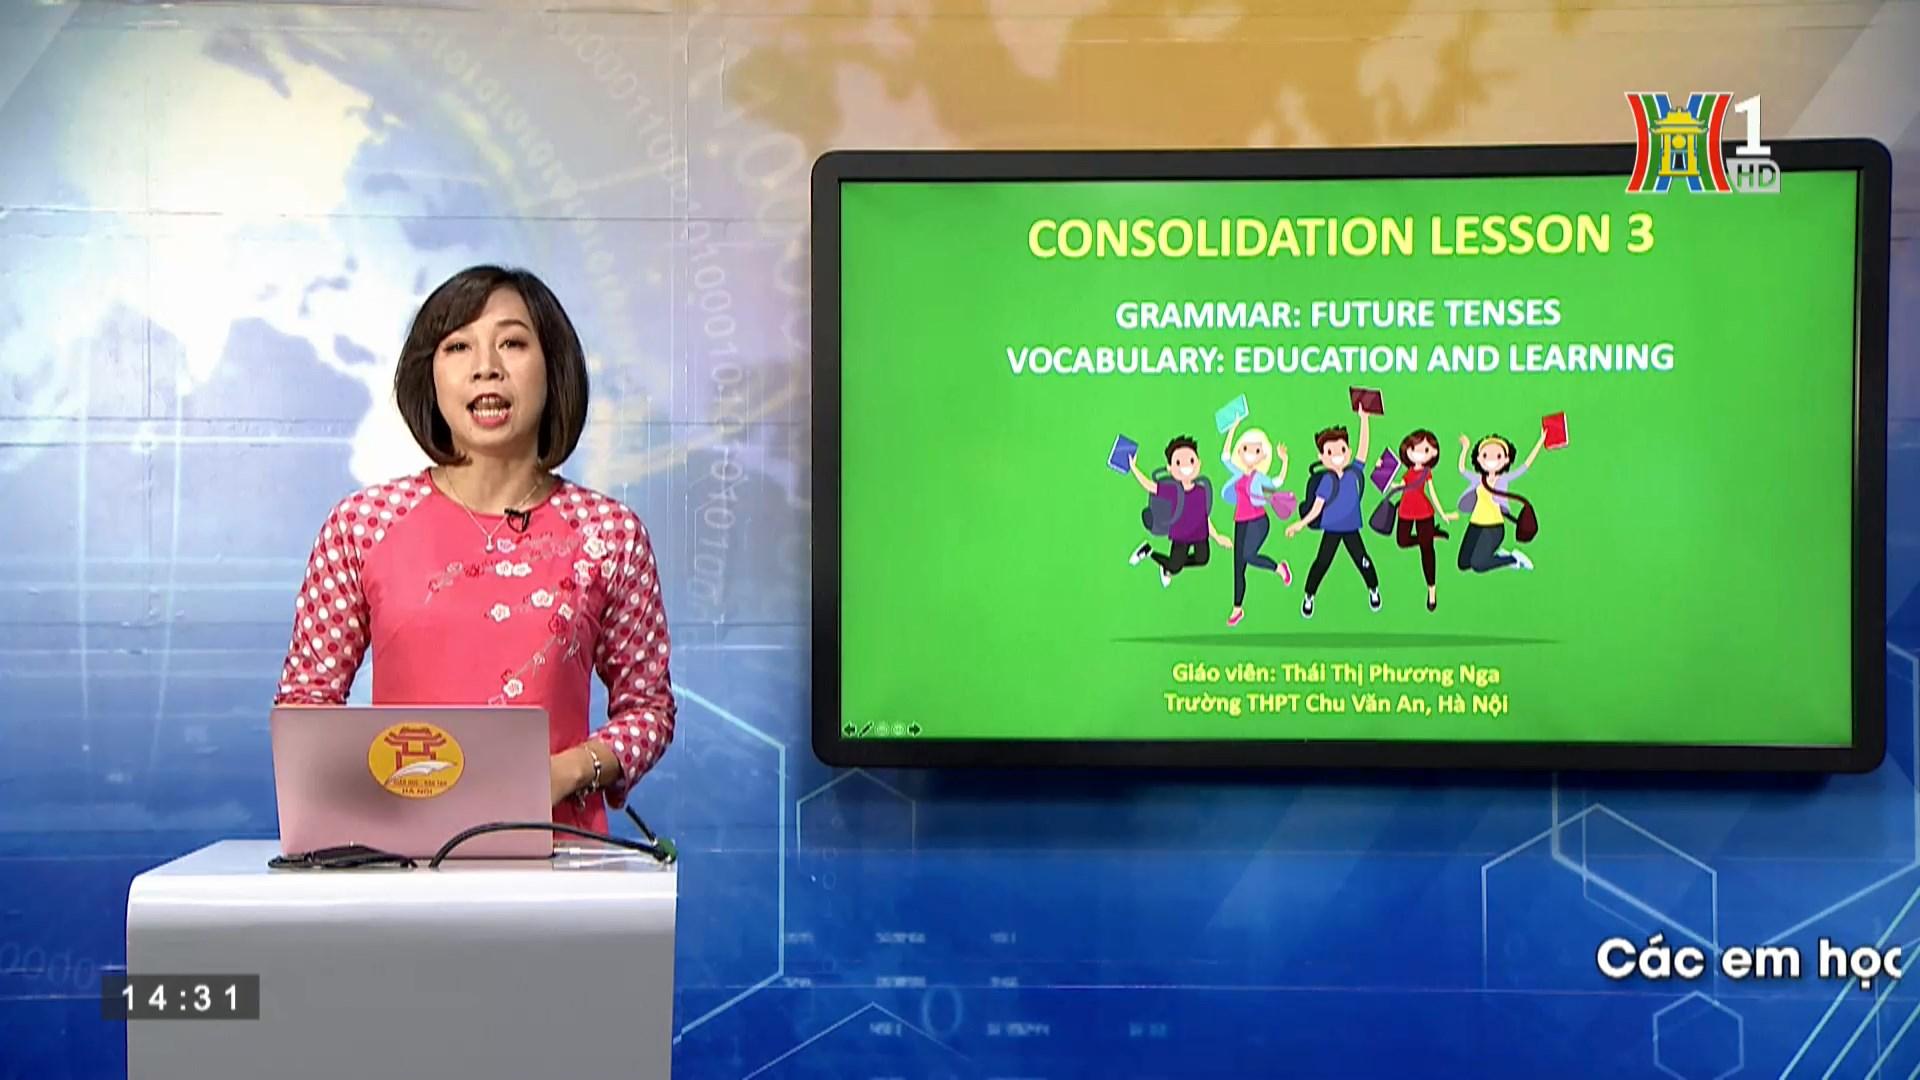 Ôn tập chuyên đề 3: Future tenses Topic Education and learning